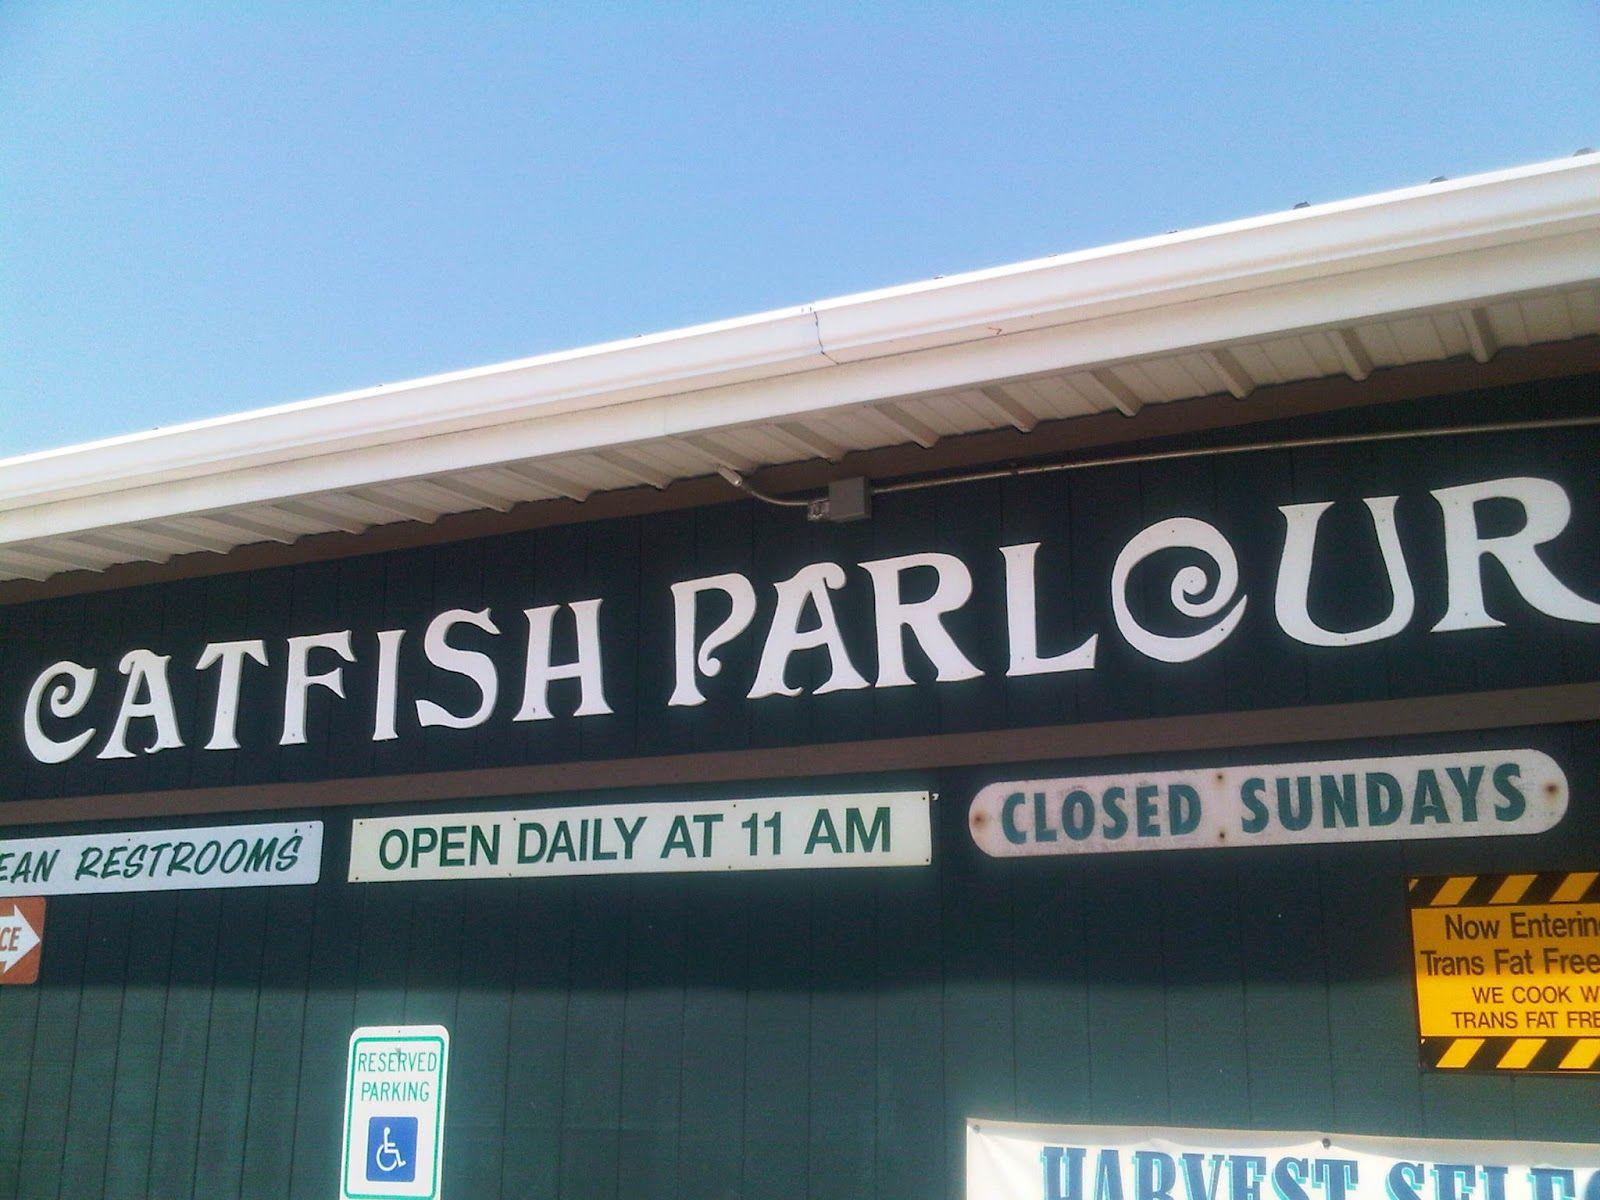 Catfish Parlour Austin, Tx Places to eat, Catfish